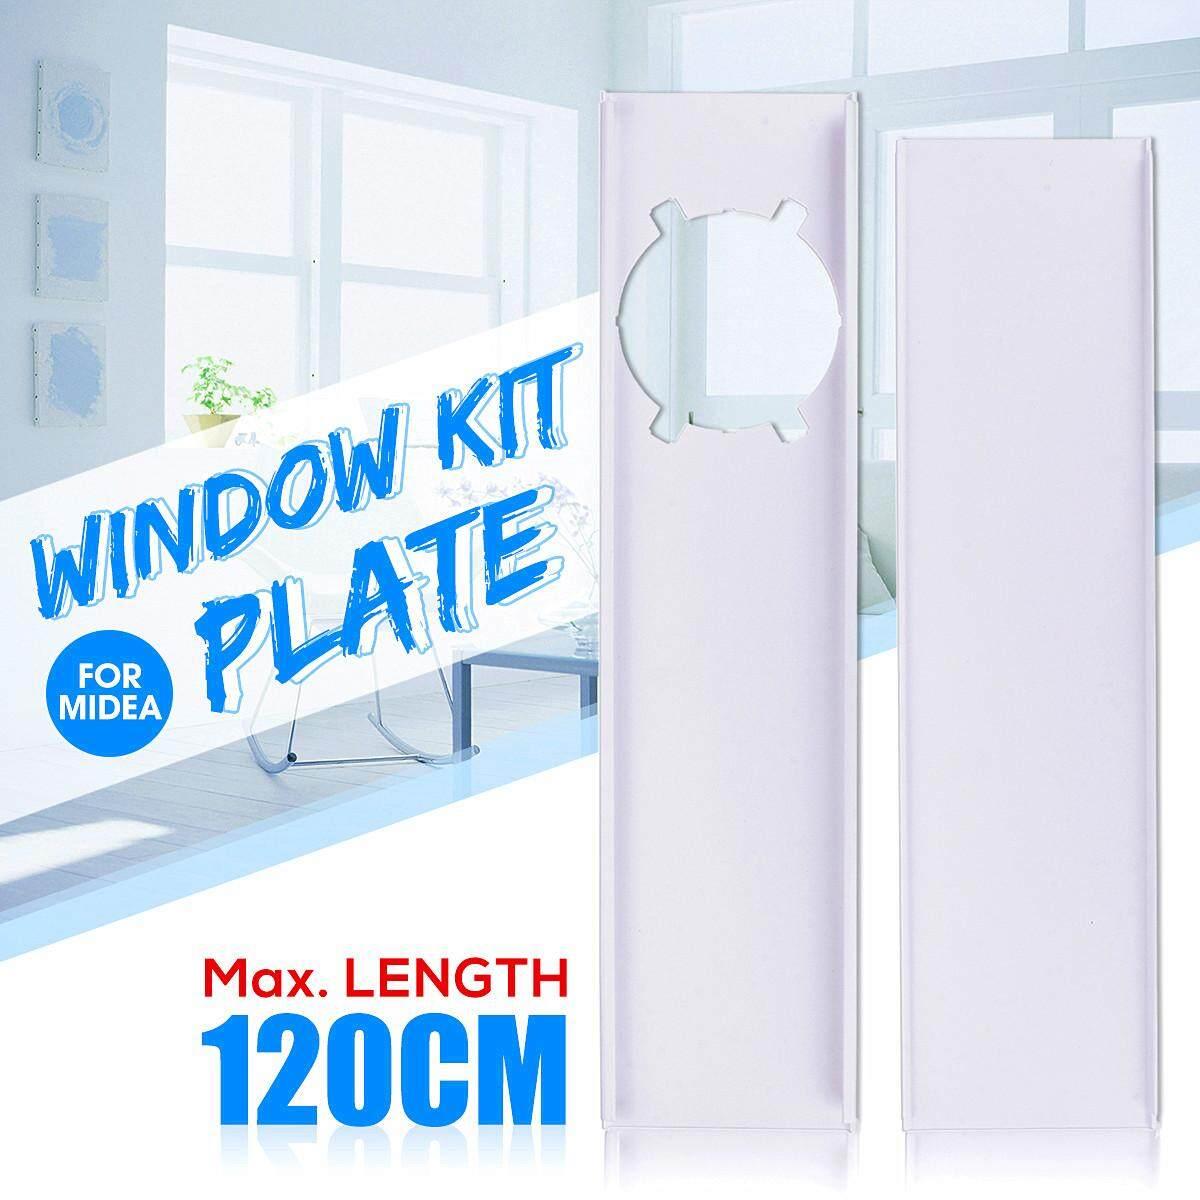 2 Pcs 120 Cm Jendela Piring Slide Disesuaikan Kit untuk Midea Pendingin Ruangan Portable